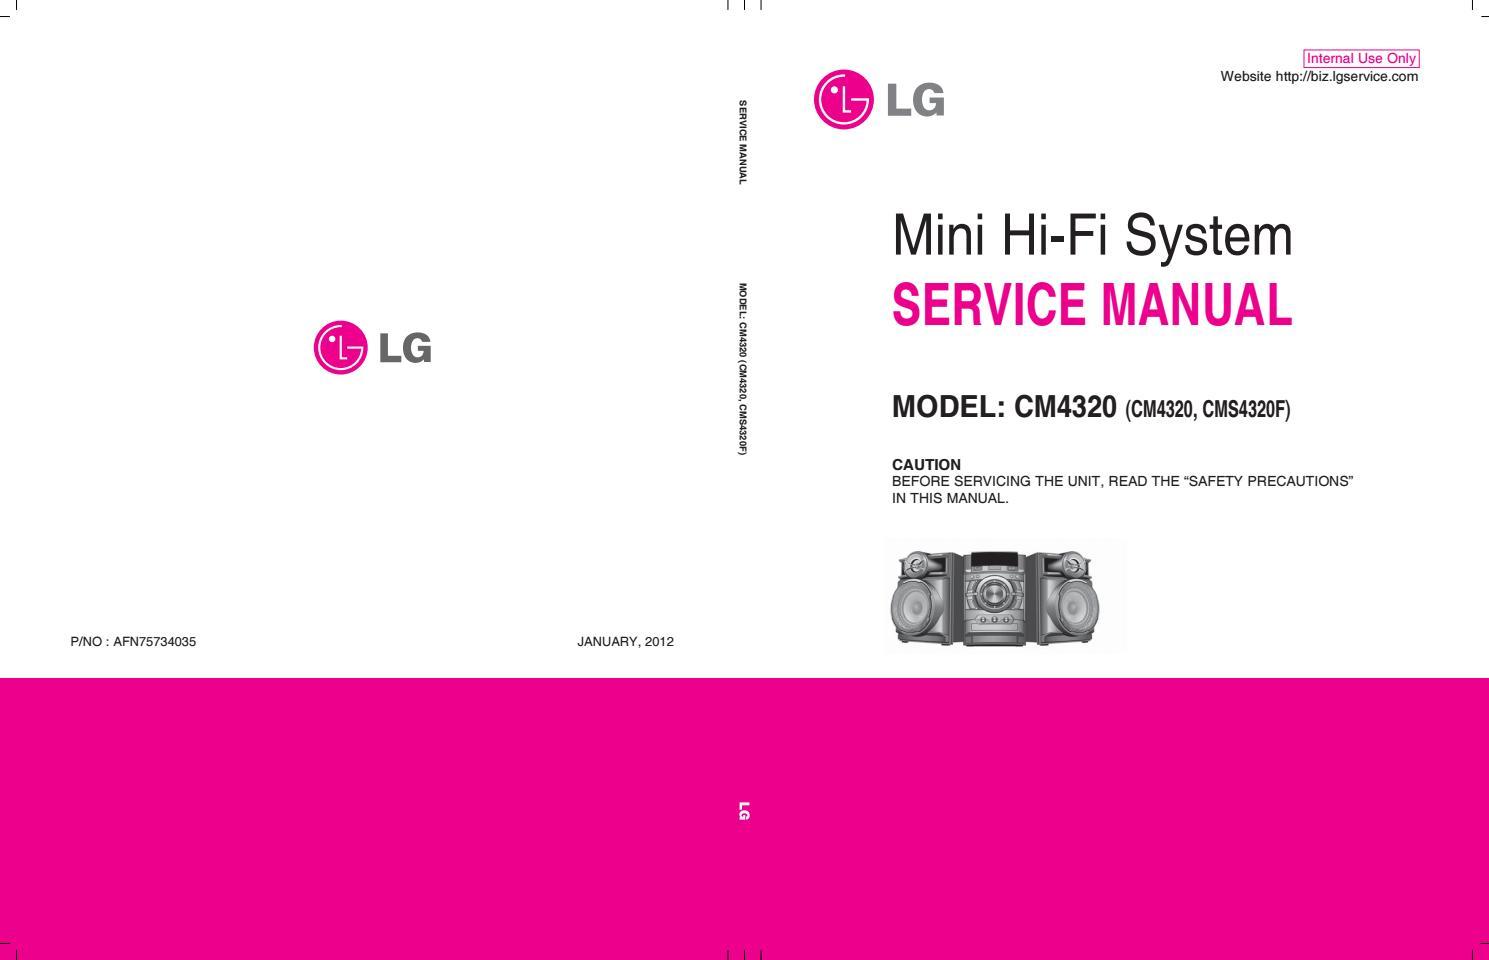 Manual De Servi U00e7o Mini System Lg Cm4320 By Portal Da